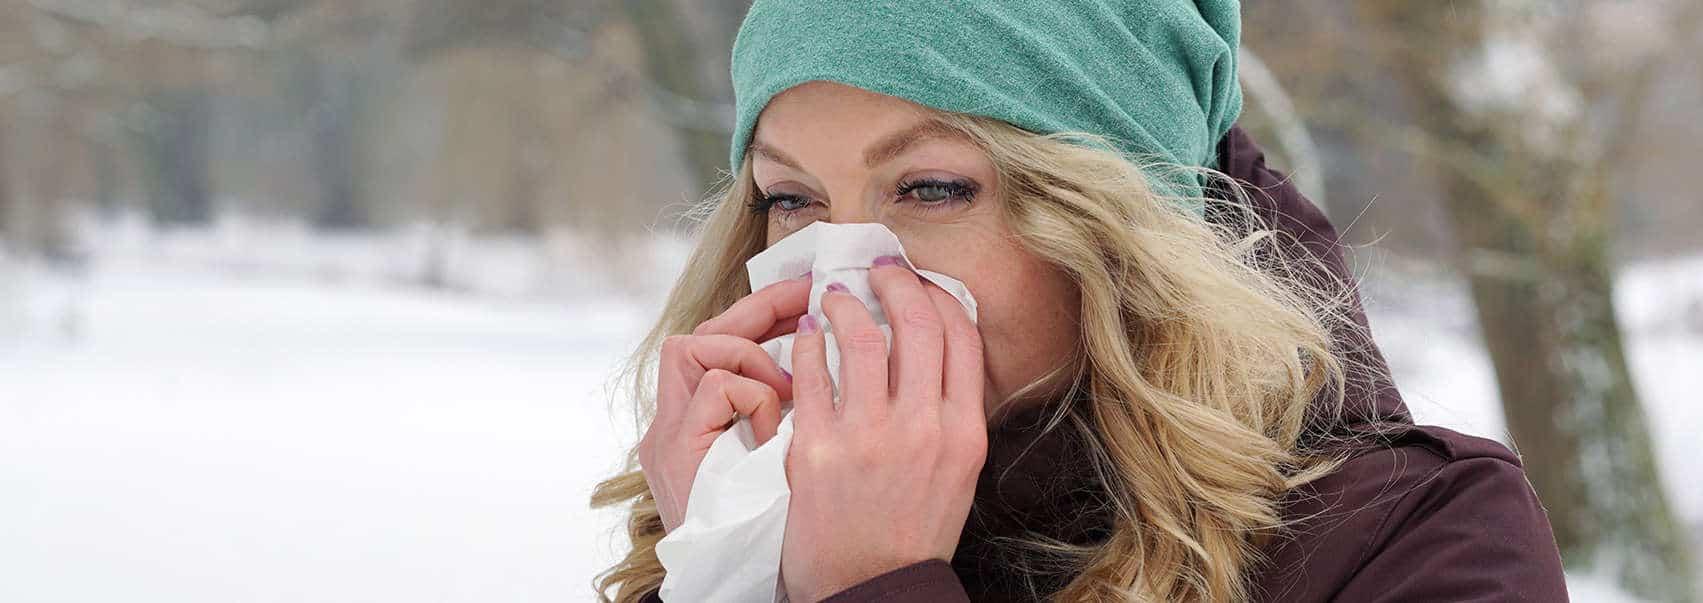 Rhume ou grippe